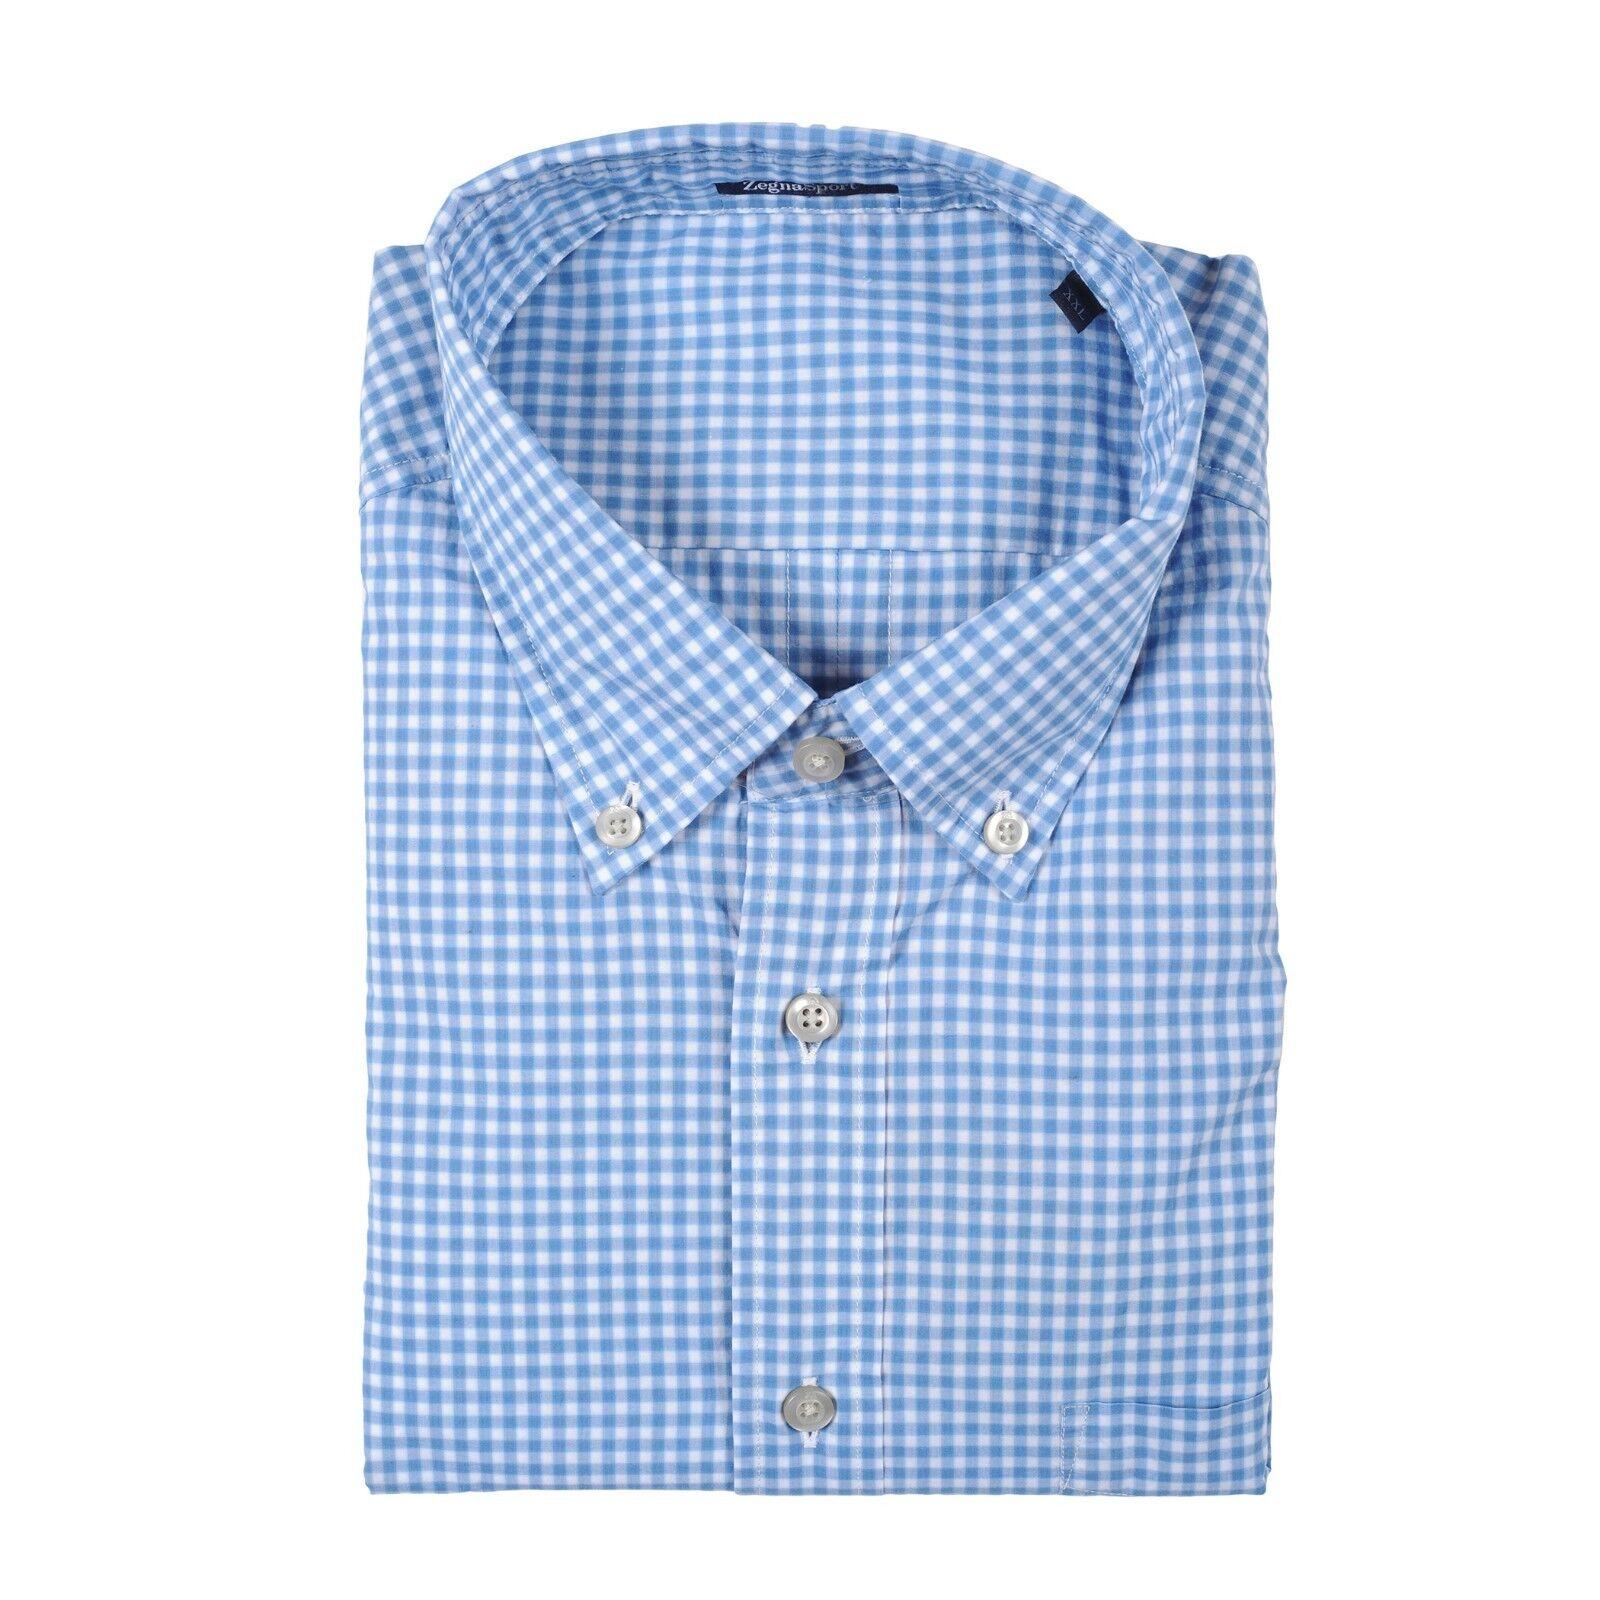 Z Zenga Herren 100% Cotton Regular Passform Blau Freizeit Anzugshemd